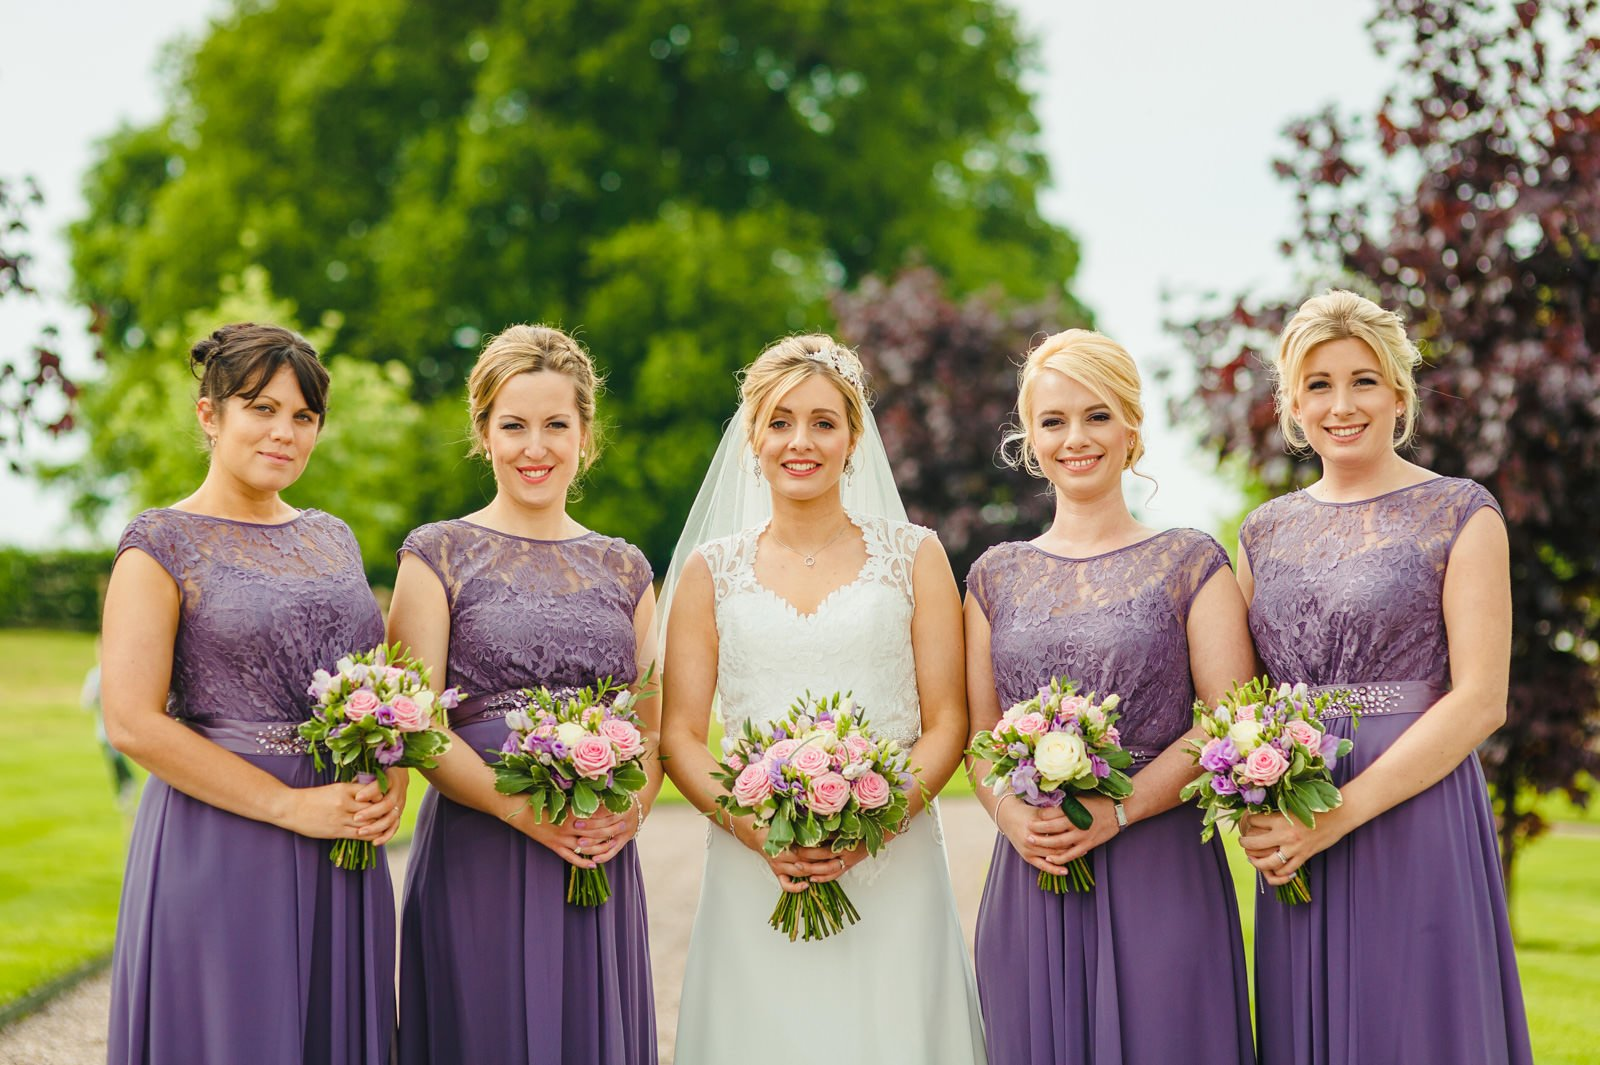 Millers Of Netley wedding, Dorrington, Shrewsbury | Emma + Ben 47